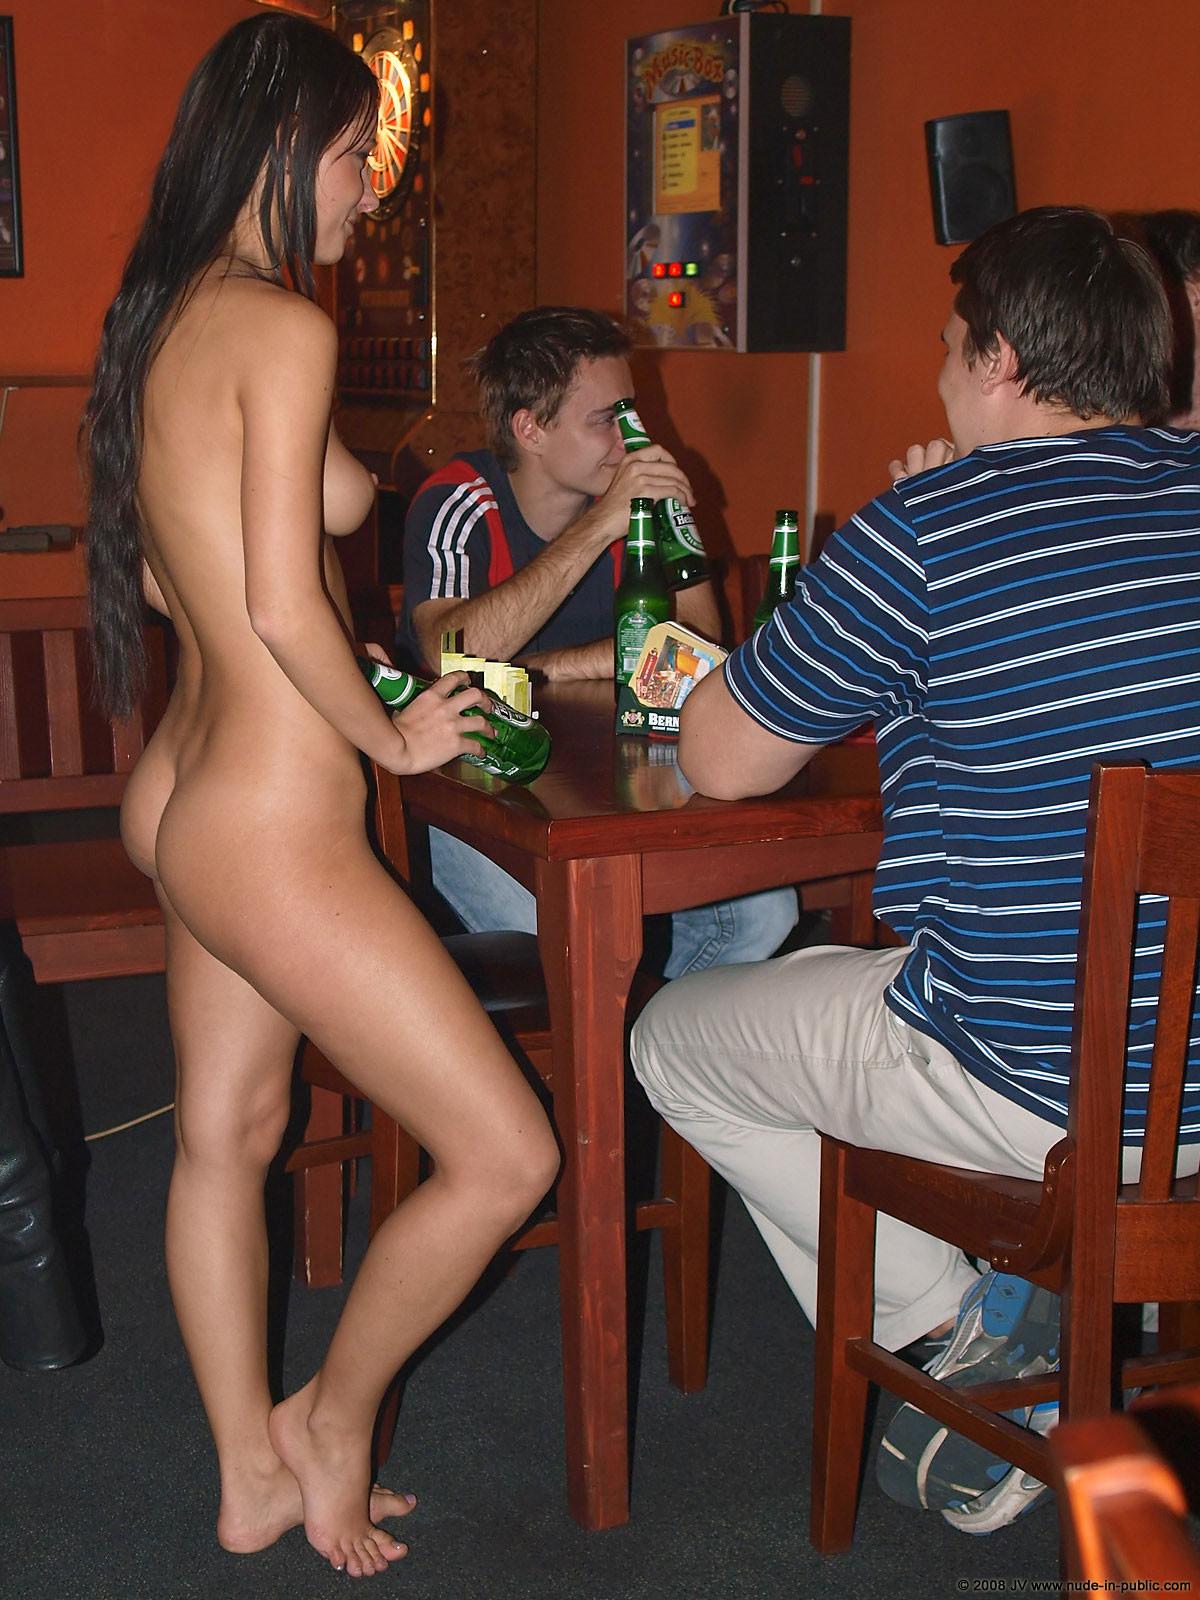 melisa-pub-beer-bar-girl-nude-in-public-34